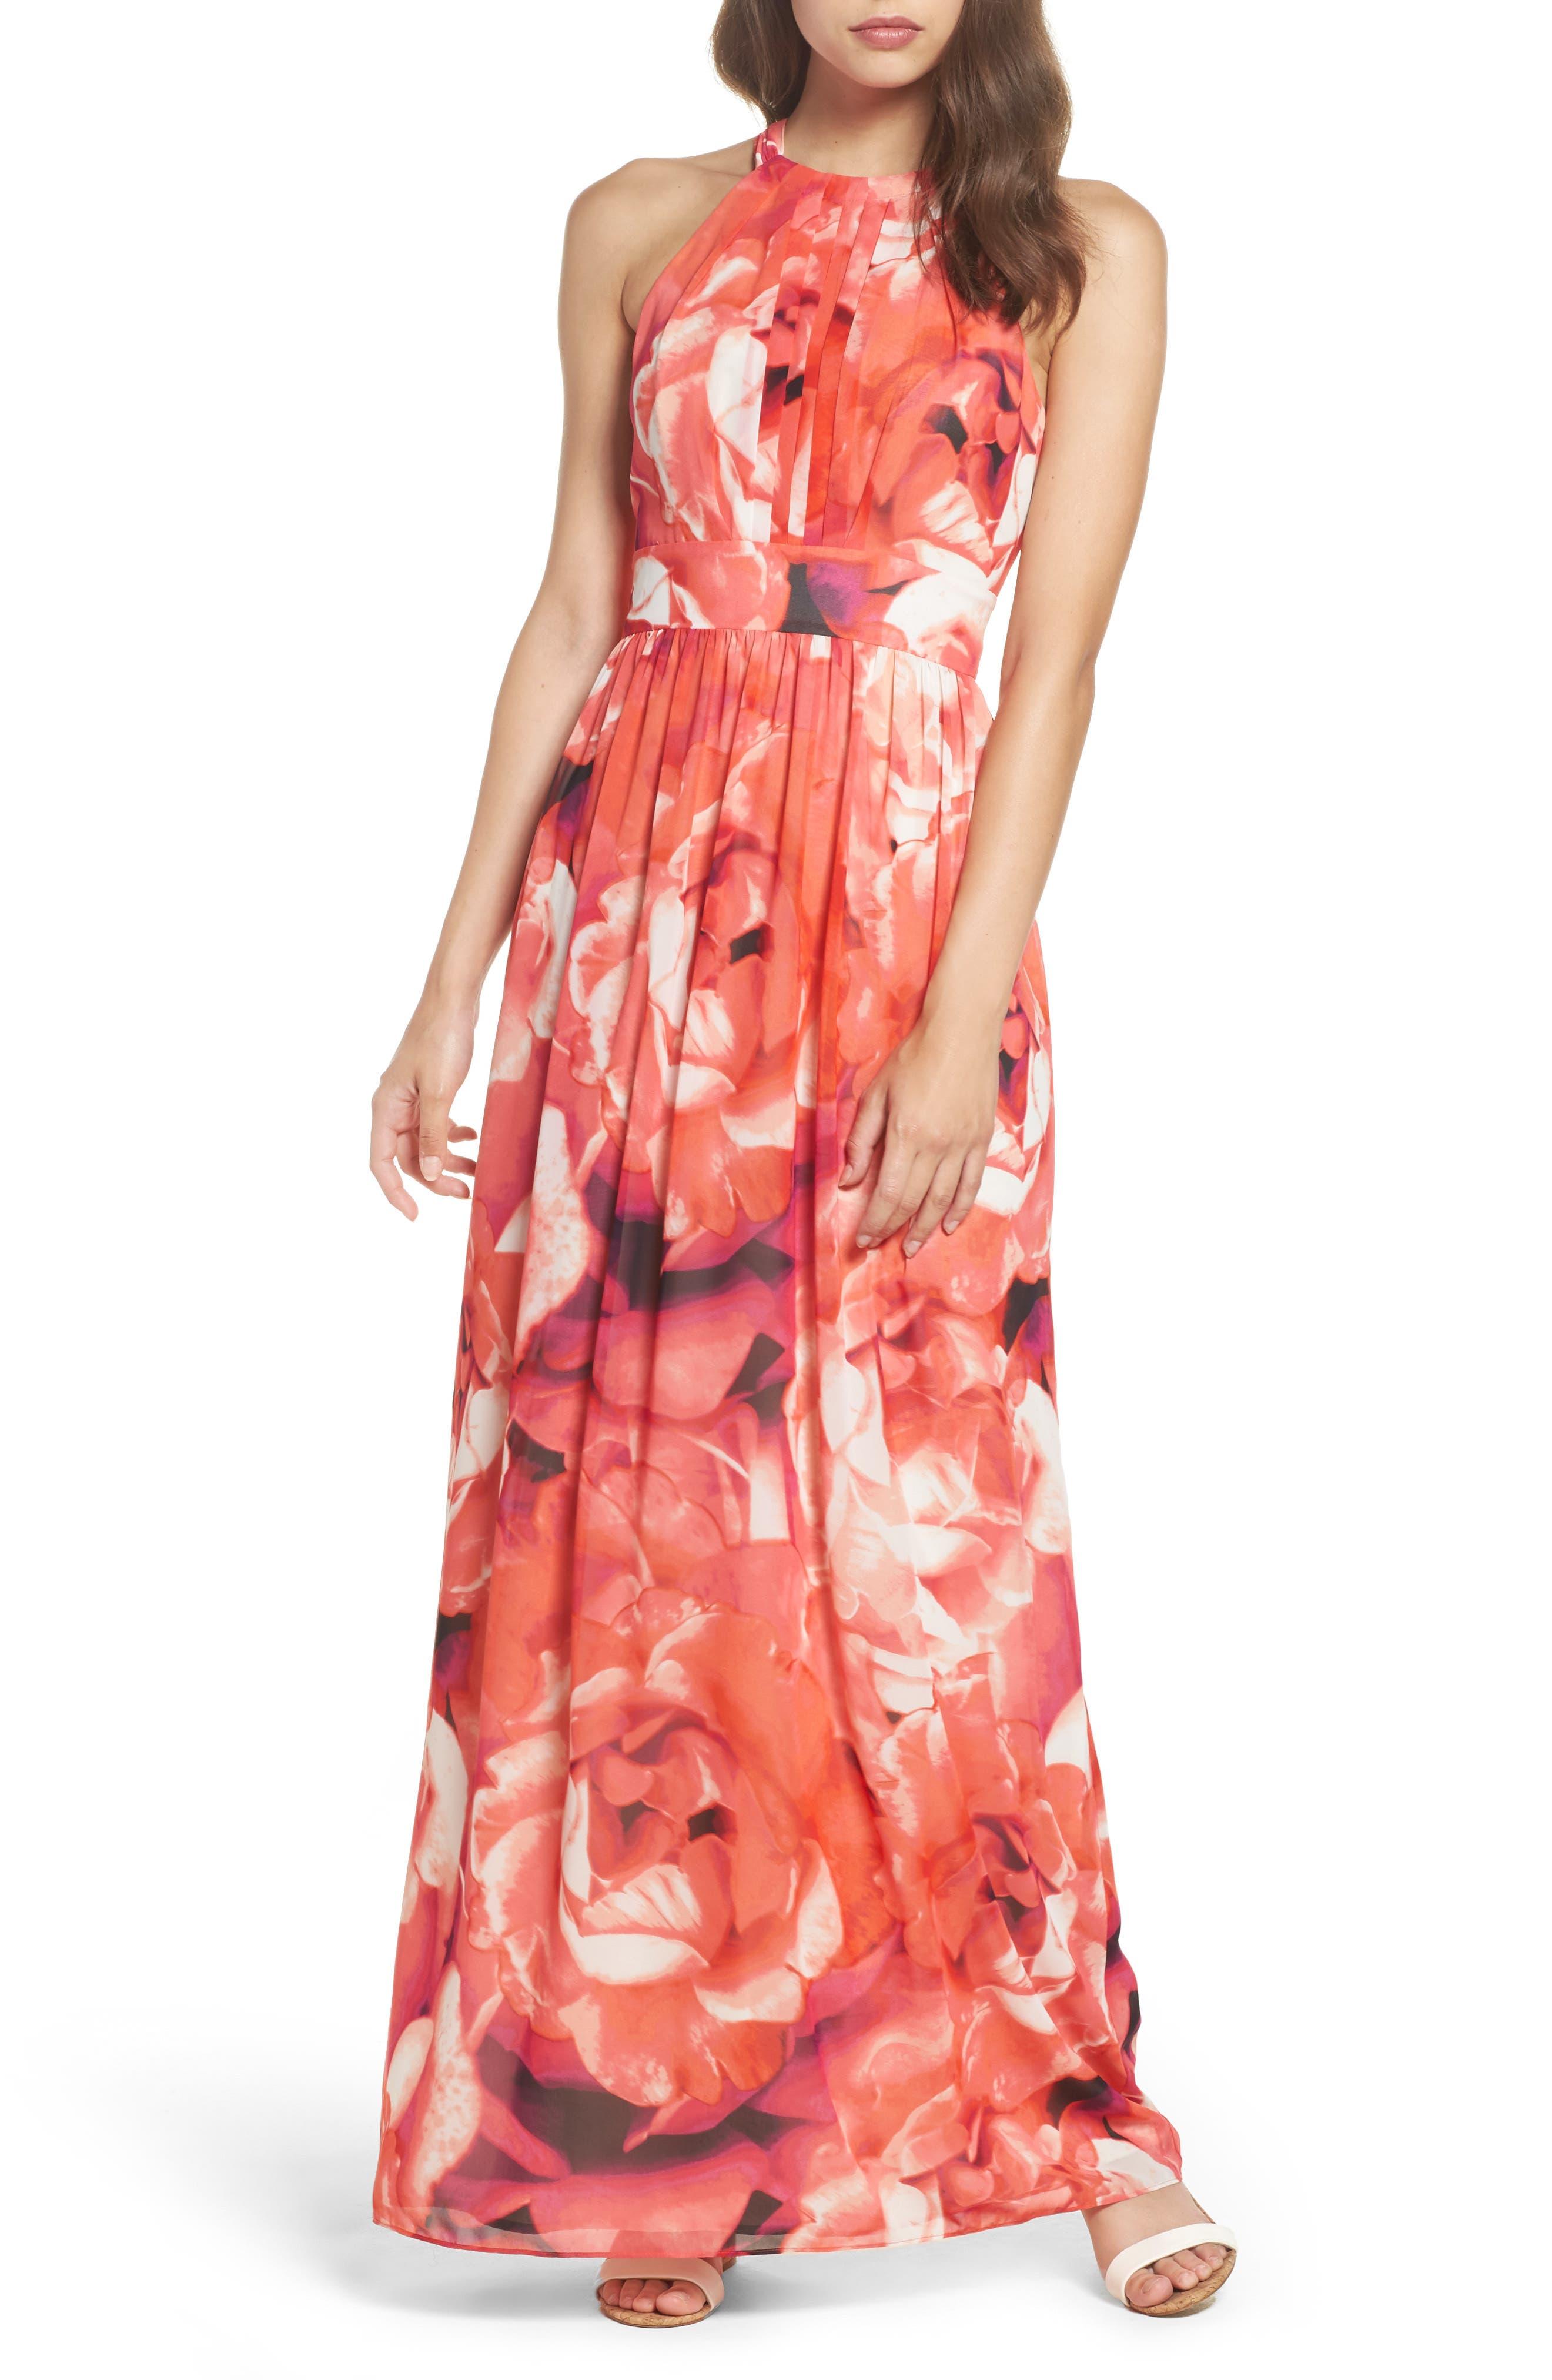 Alternate Image 1 Selected - Eliza J Print Chiffon Fit & Flare Maxi Dress